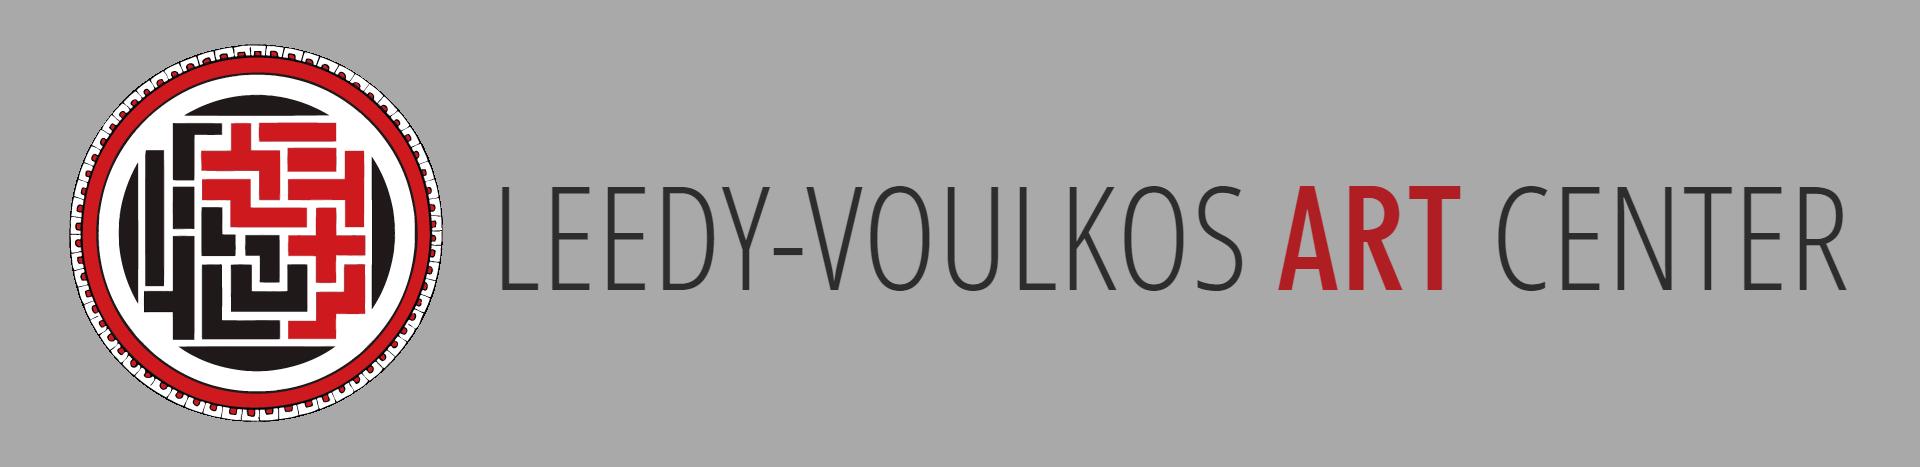 LeedyVoulkosBanner.png